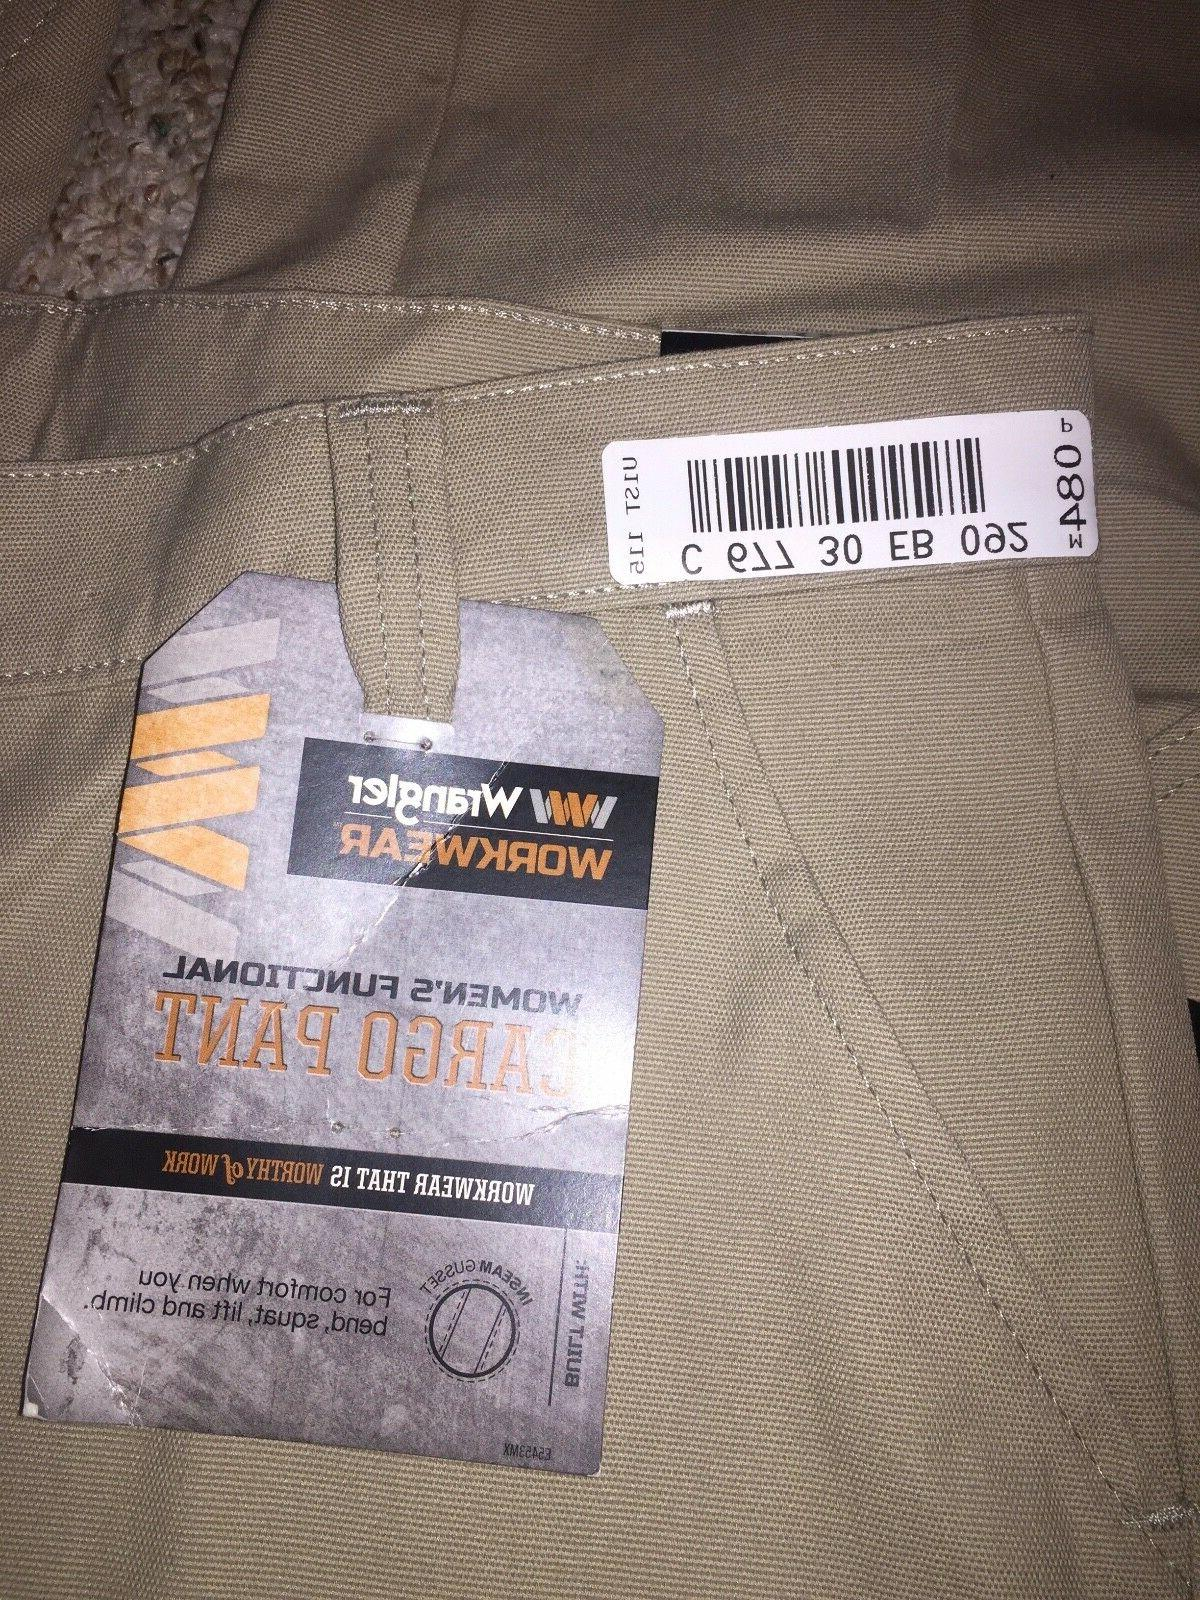 Wrangler Women's Cargo Pant Tags